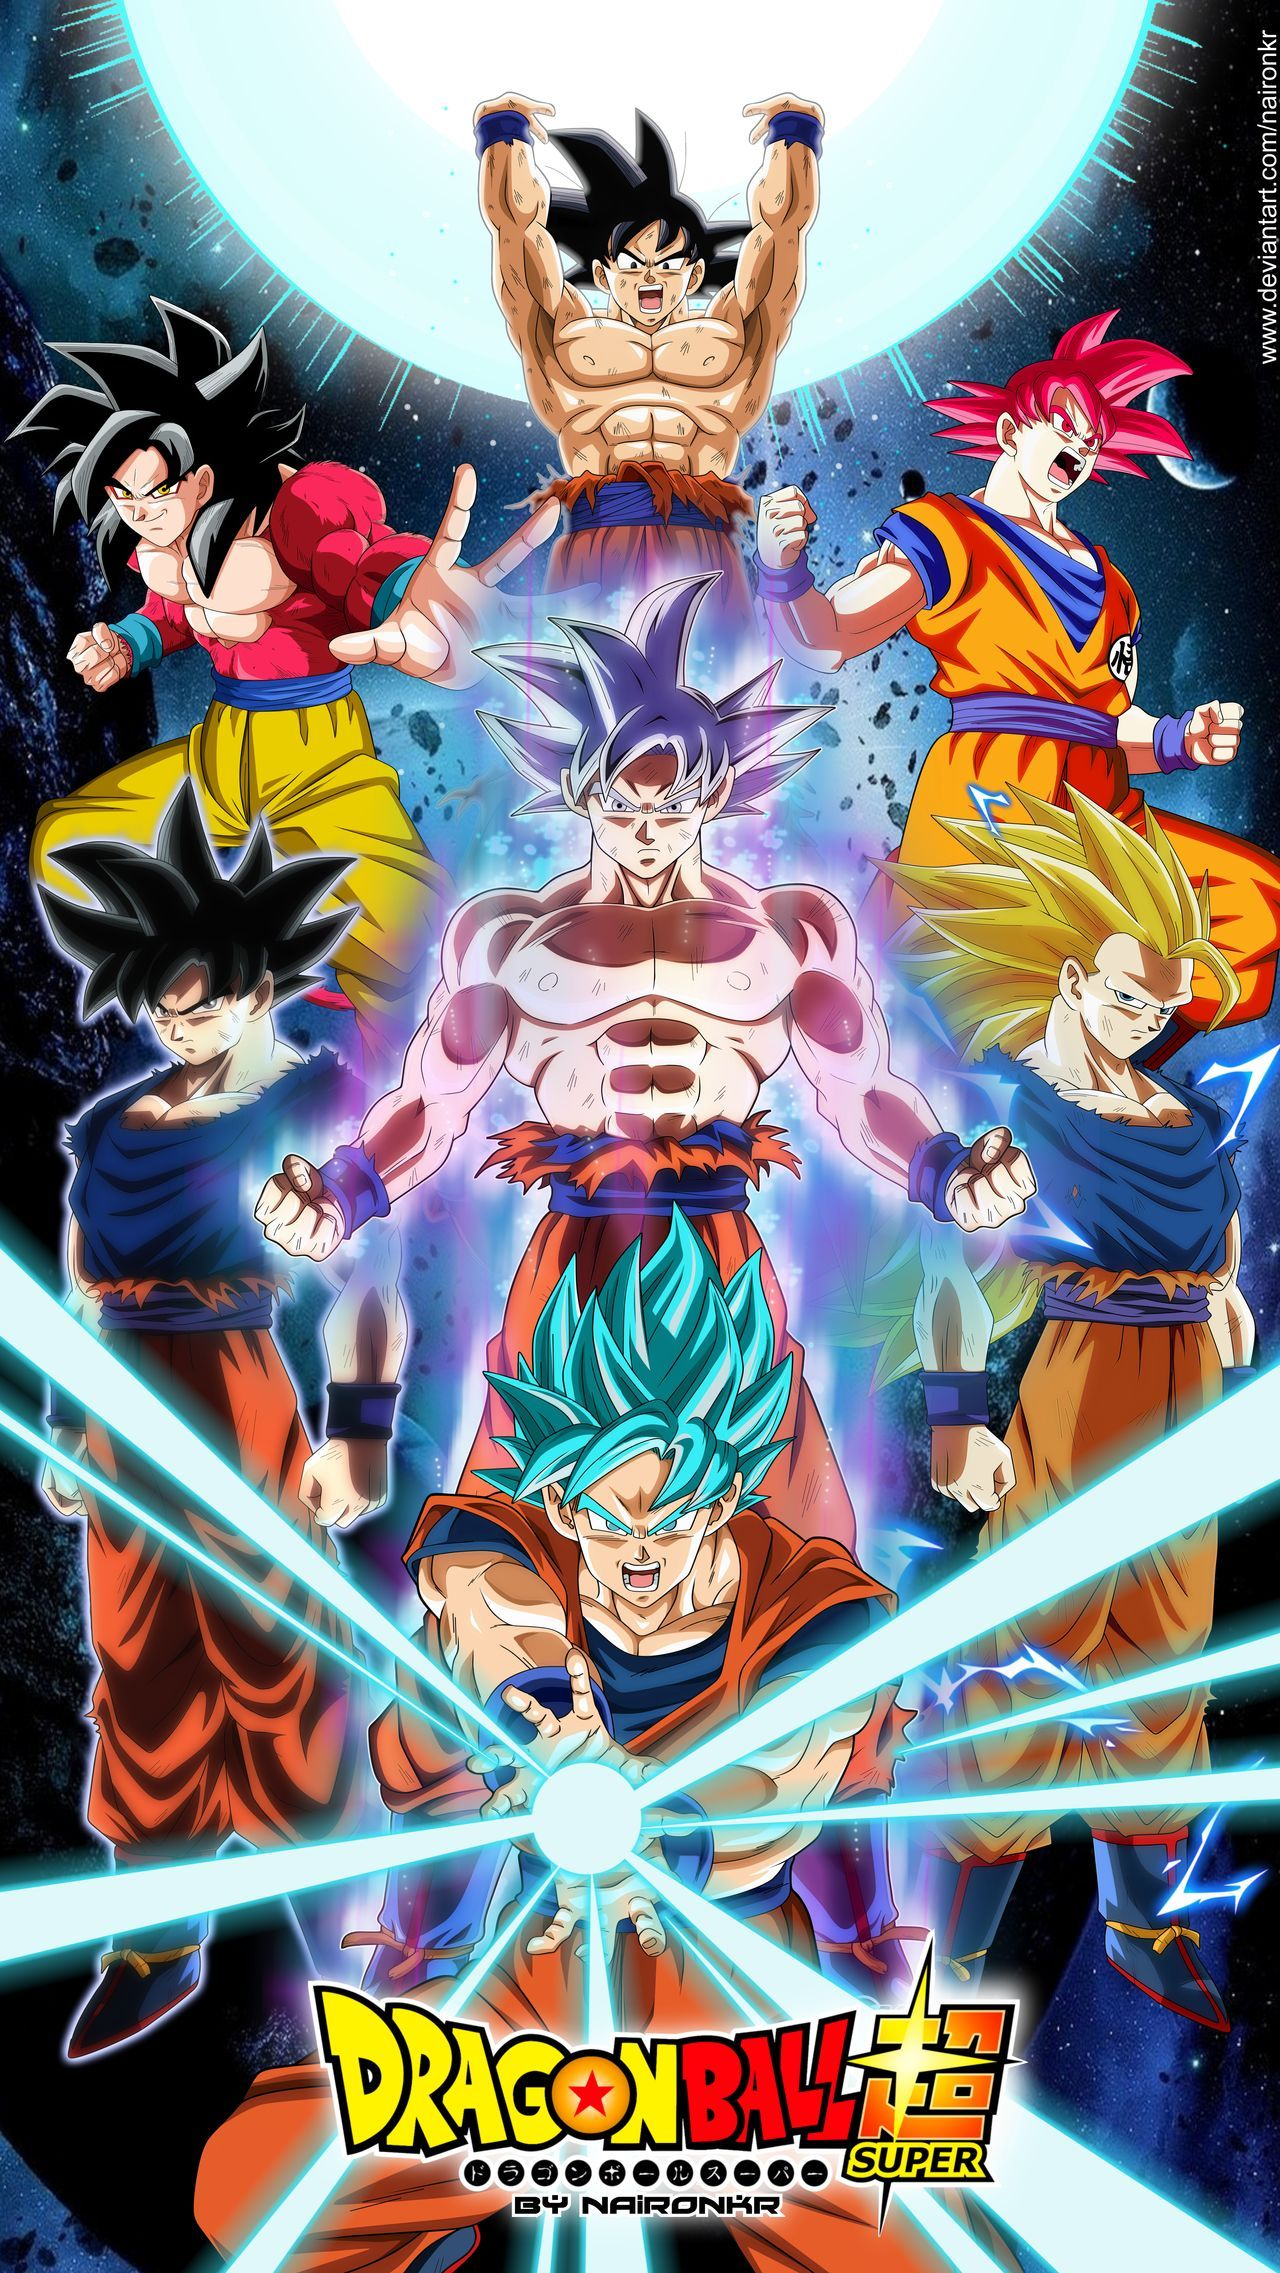 Goku Dragon Ball Super Dragon Ball Super Goku Dragon Ball Super Artwork Anime Dragon Ball Super